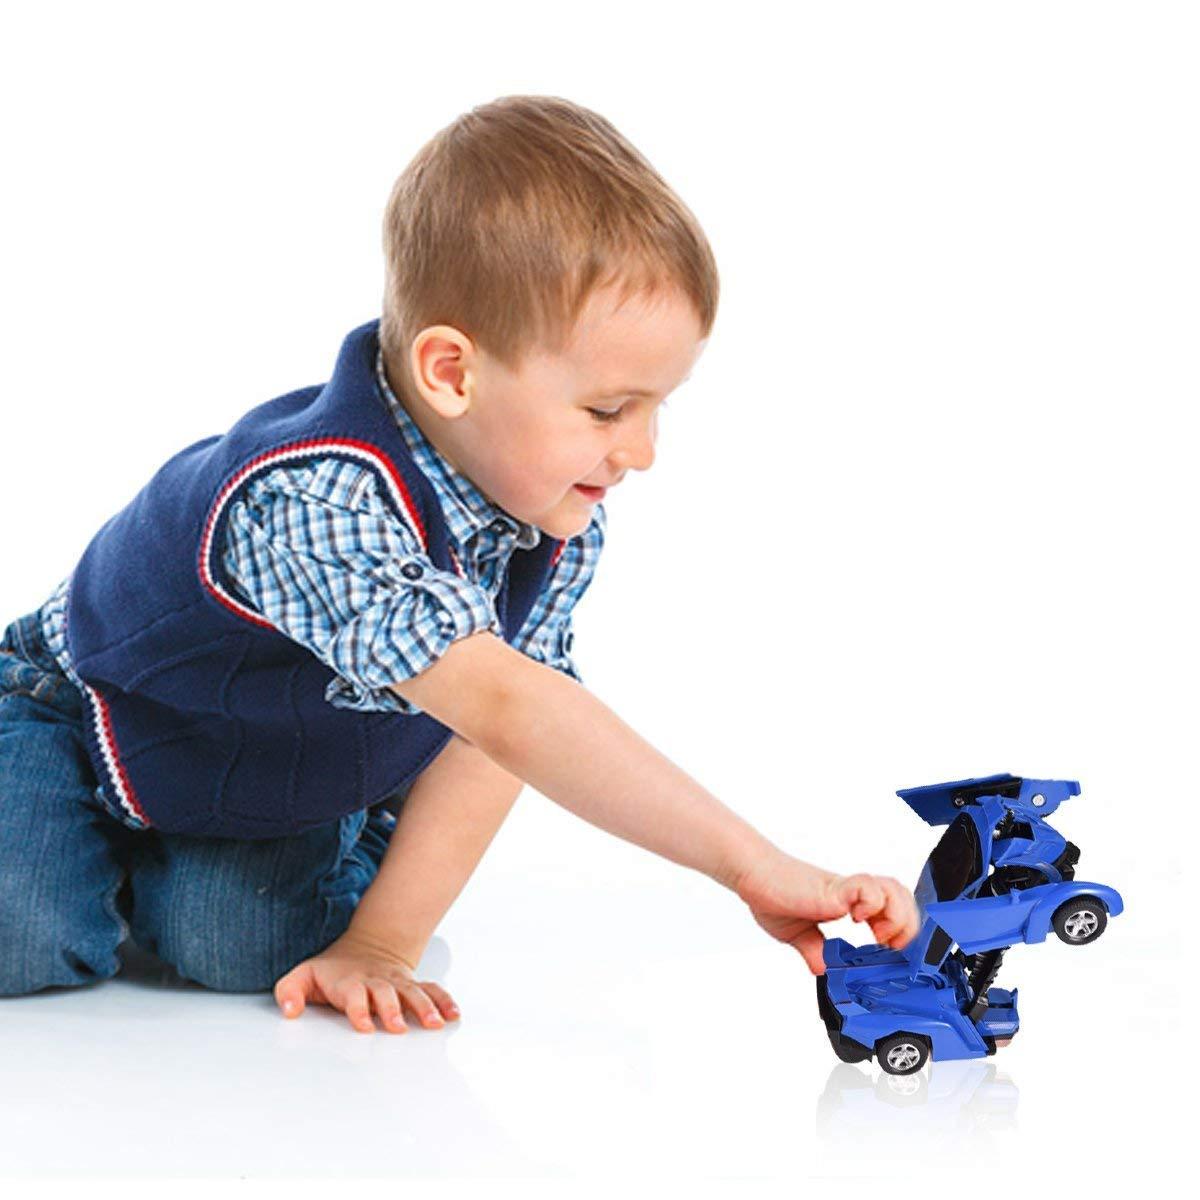 Cartoon Crash Deformation Transforming Robot Car Toy Kids Game Gift Electrical Safety (2pcs, Yellow&Blue) by Viedoct (Image #5)